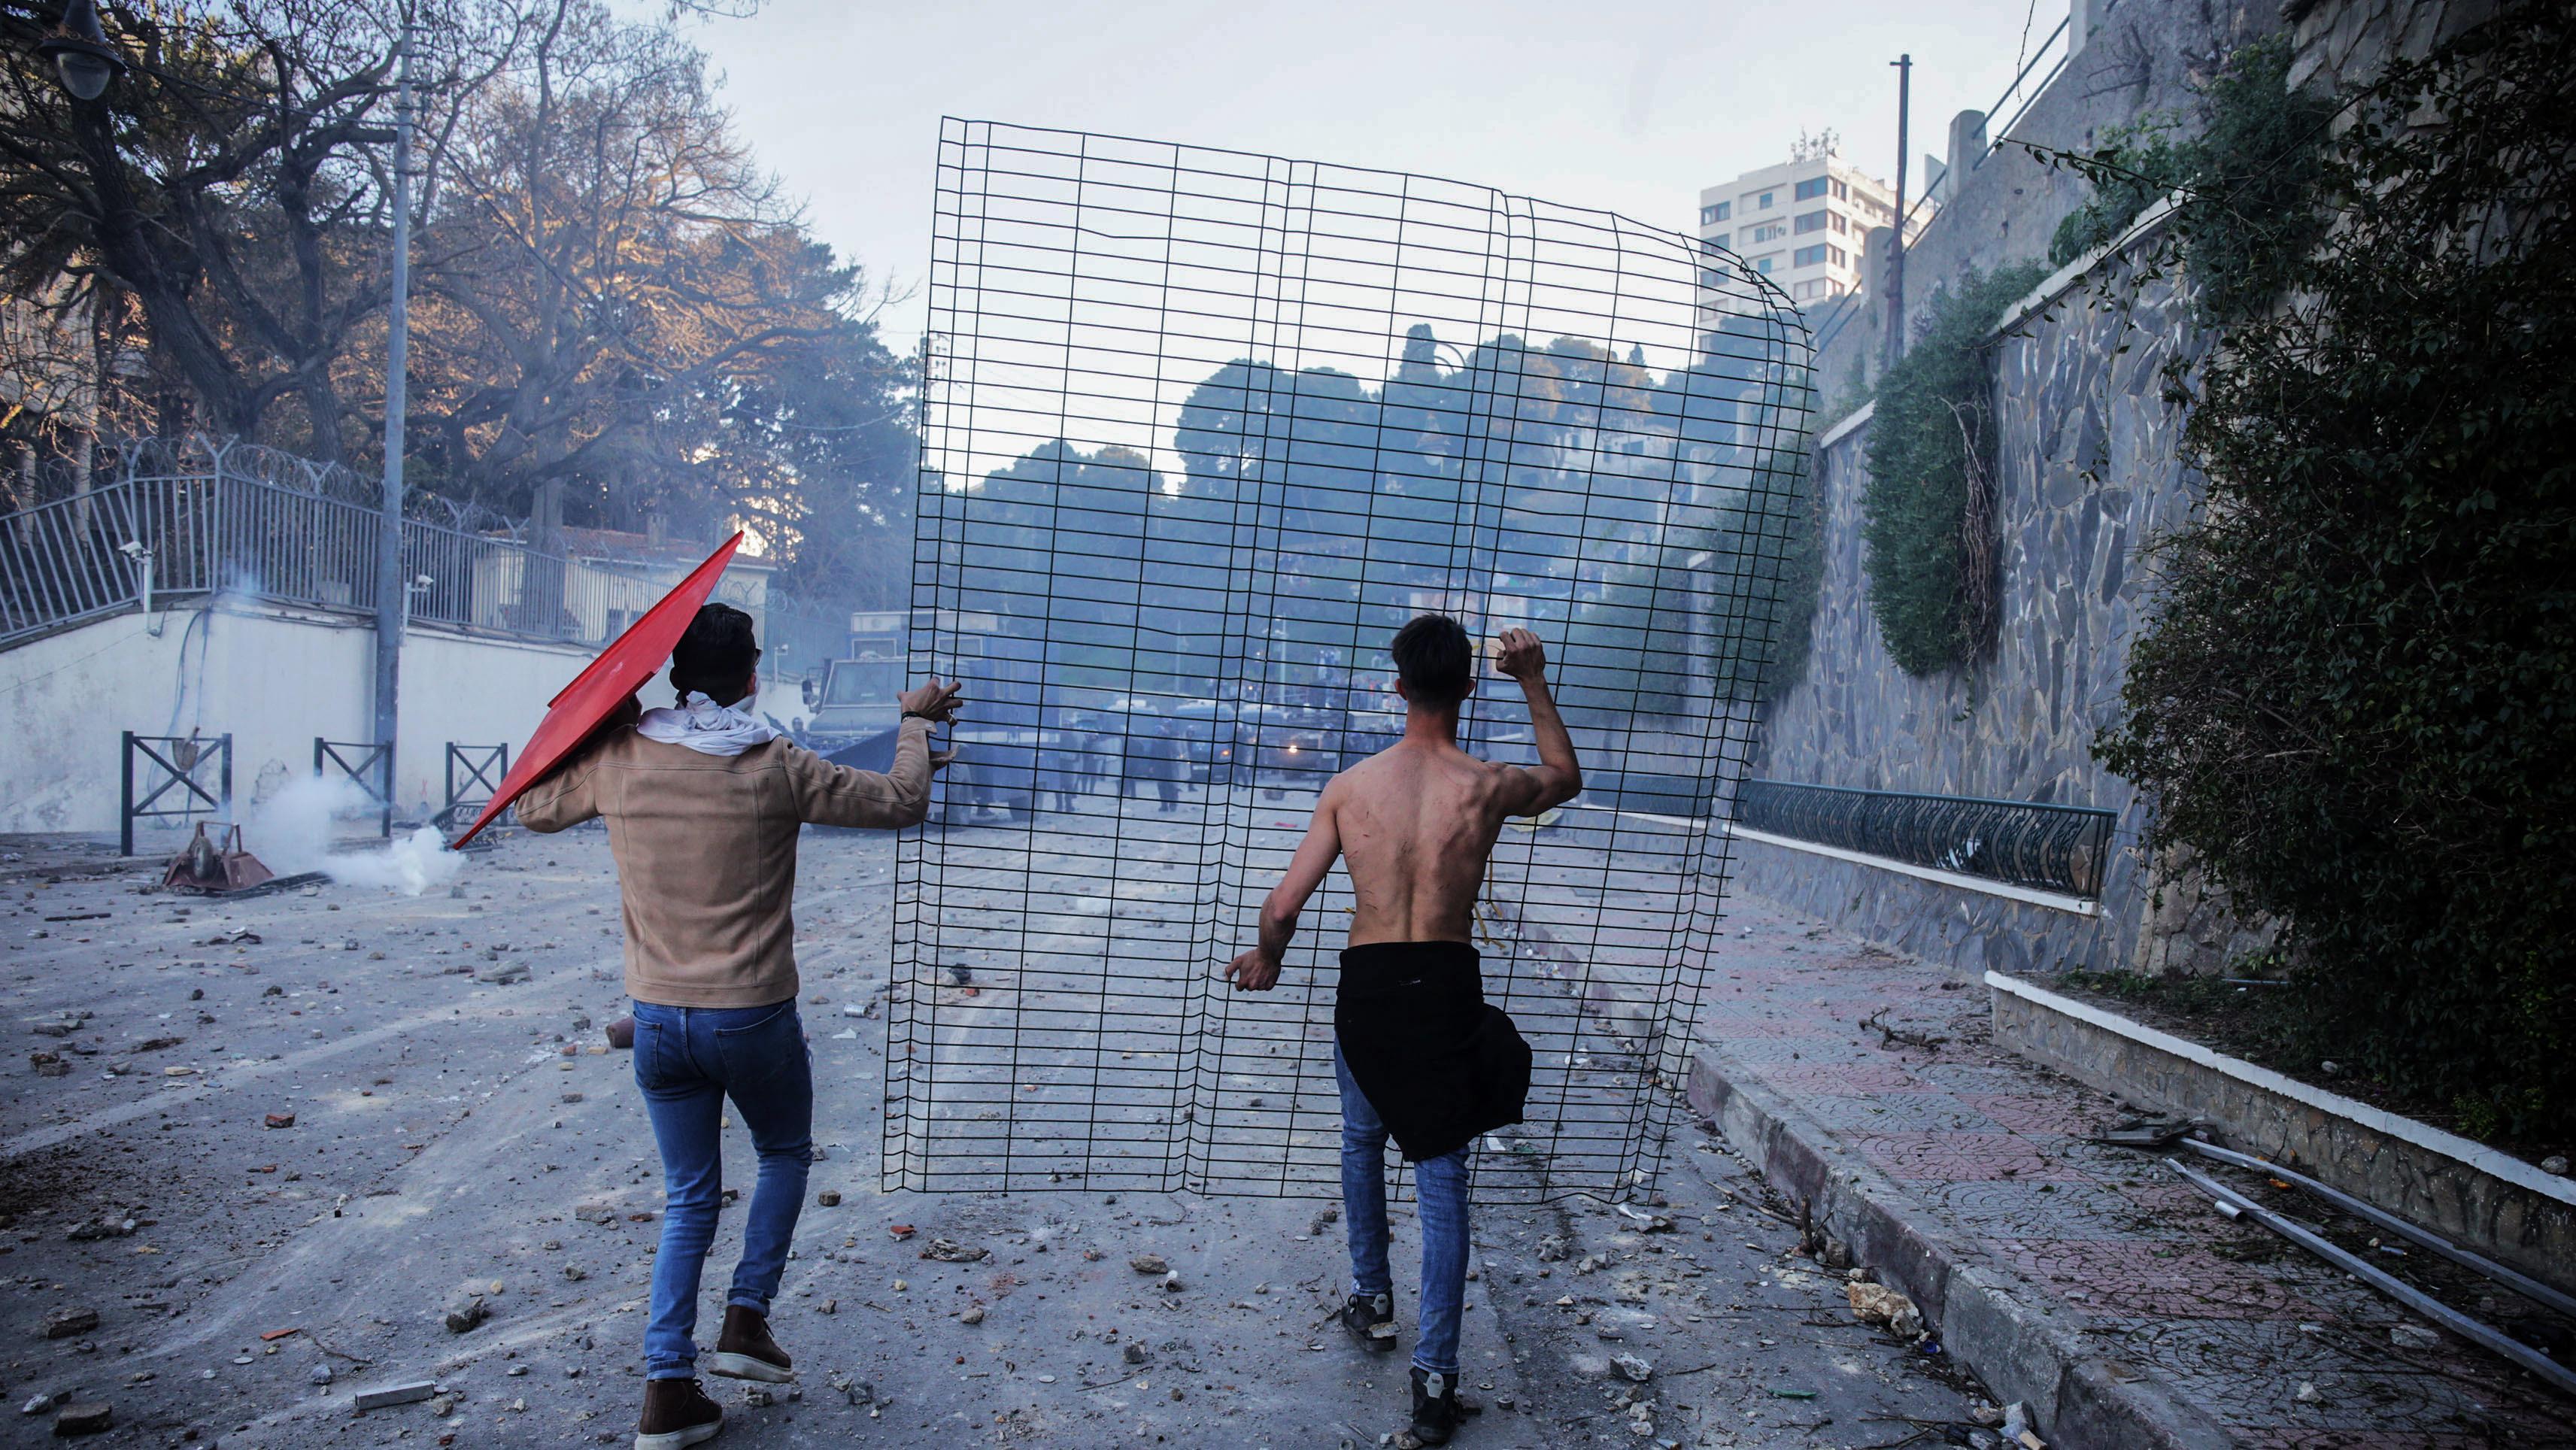 Proteste am 01. März in Algiers